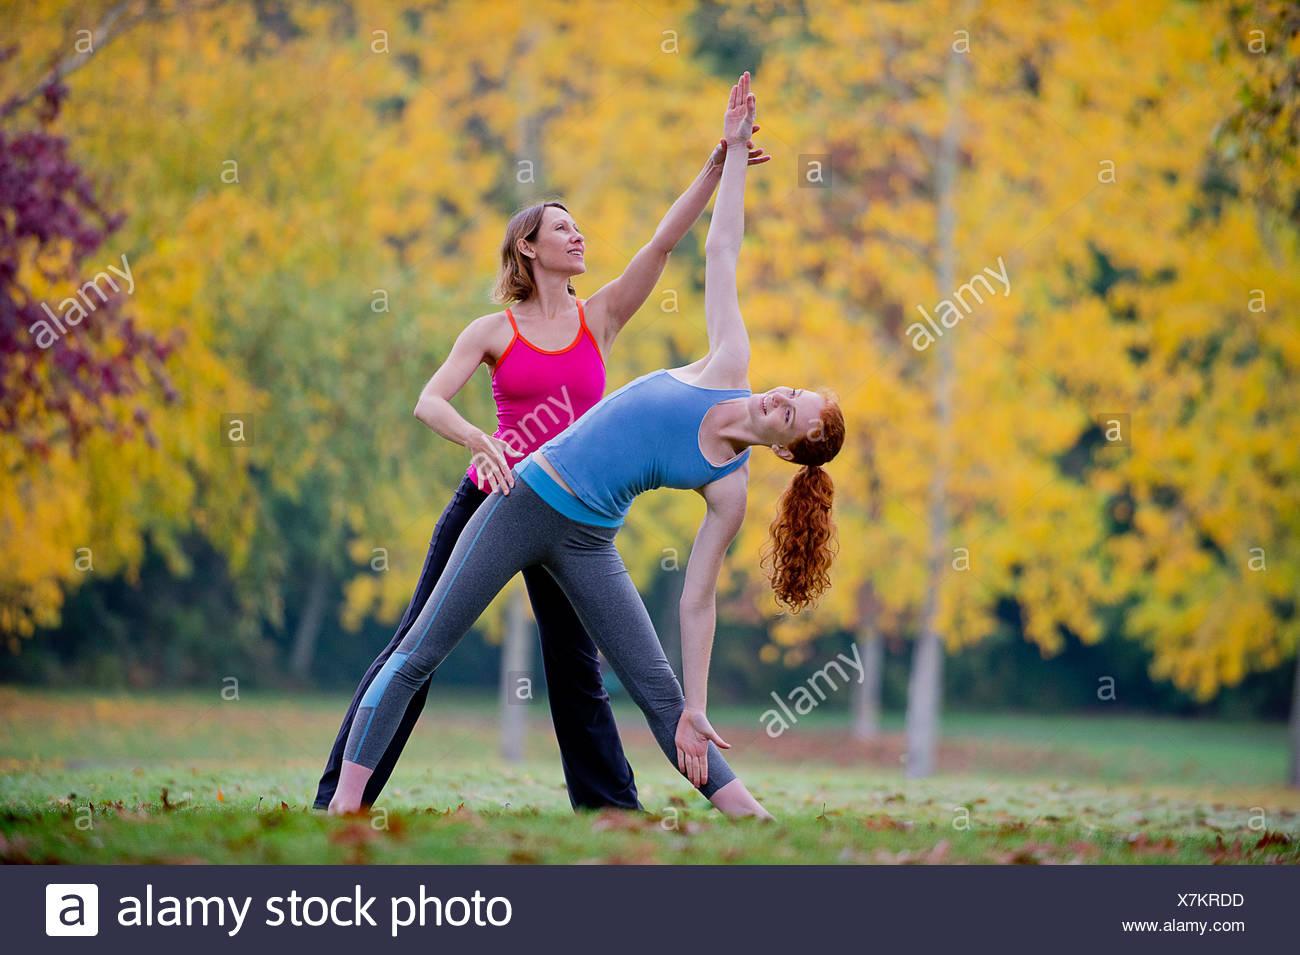 Yoga-Lehrer unterrichten junge Frau im Wald Stockbild